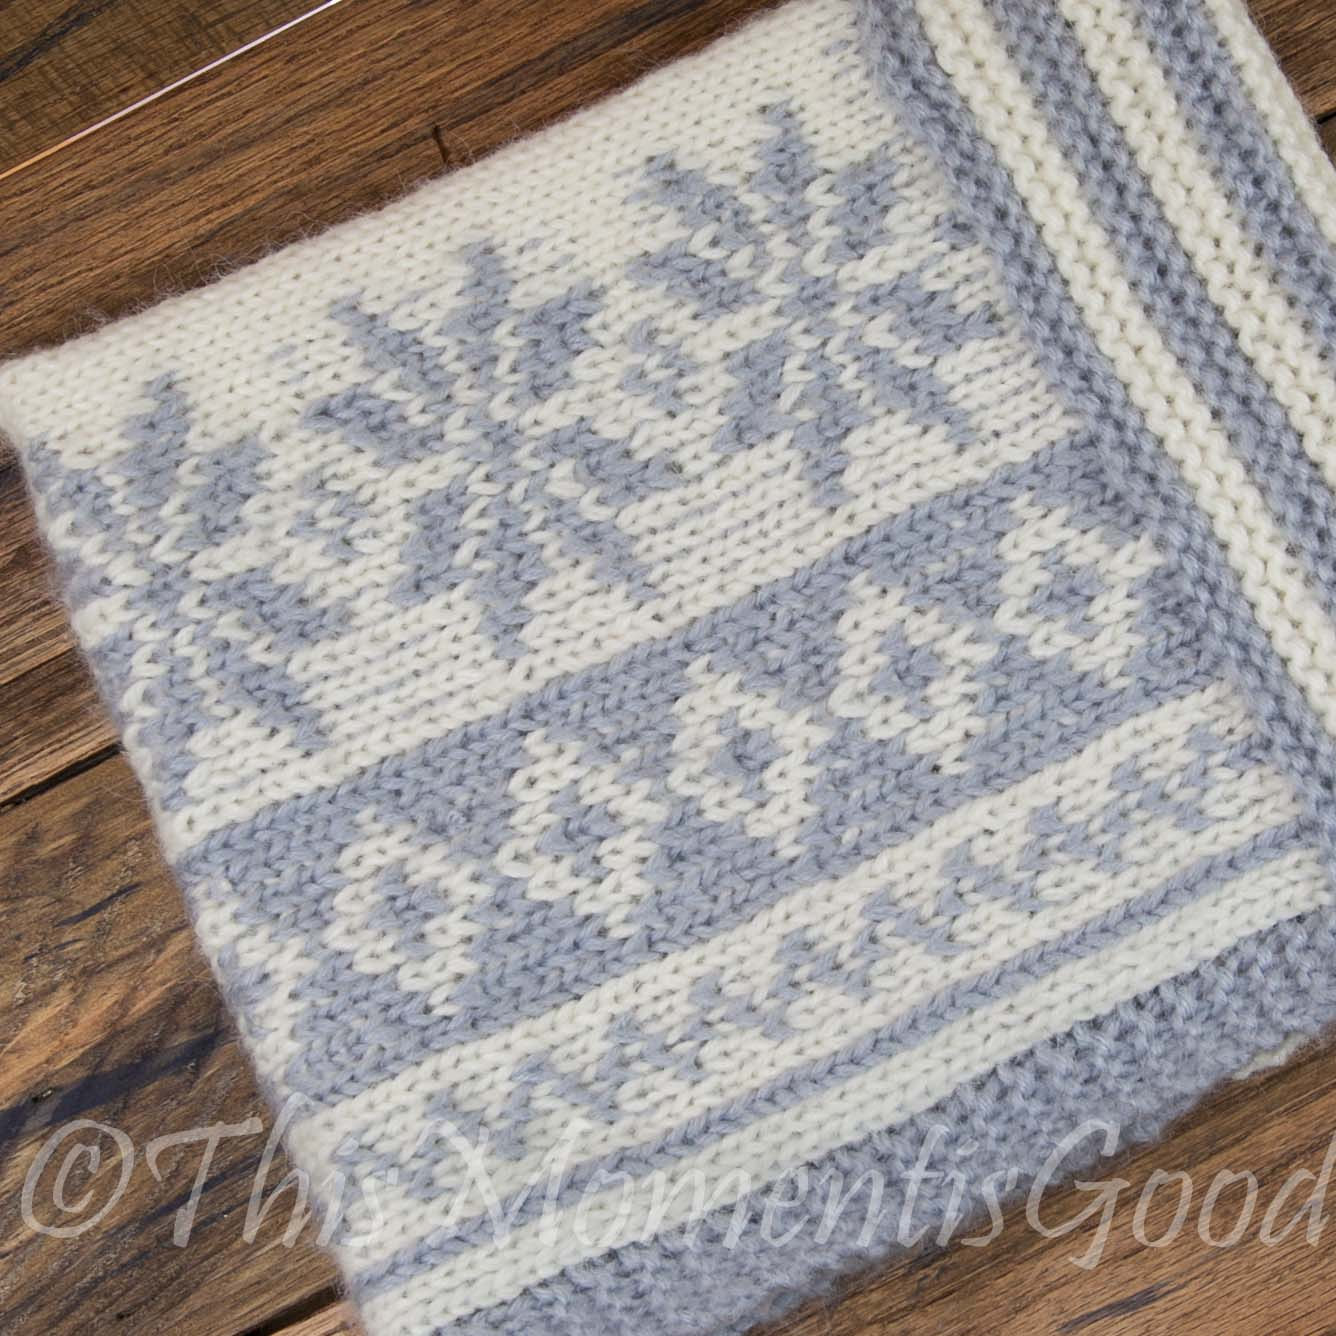 Cowl Loom Knitting Pattern : Loom Knit Fair Isle Cowl PATTERN. Loom Knit Snowflake Cowl, Scarf Patt This...